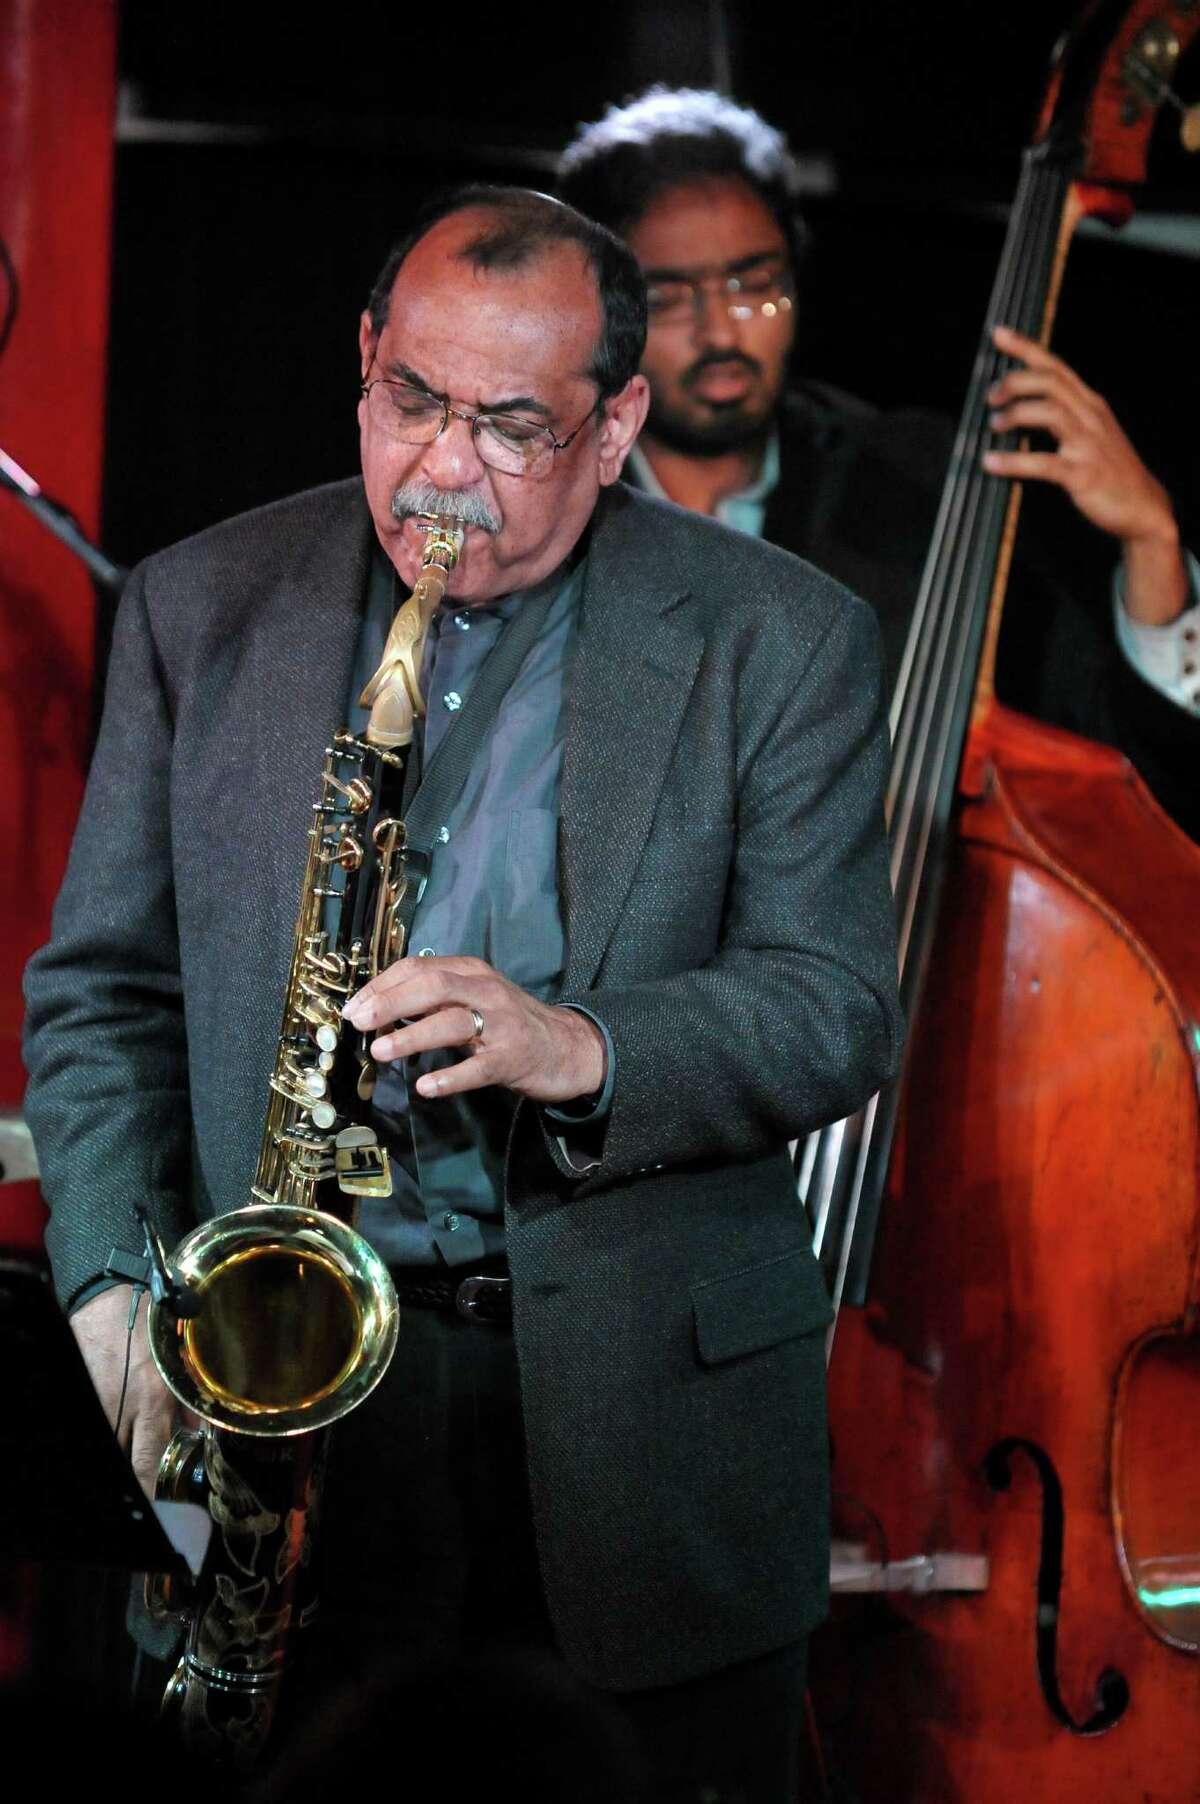 Seattle Earshot Jazz Festival (continuing): Through Nov. 11